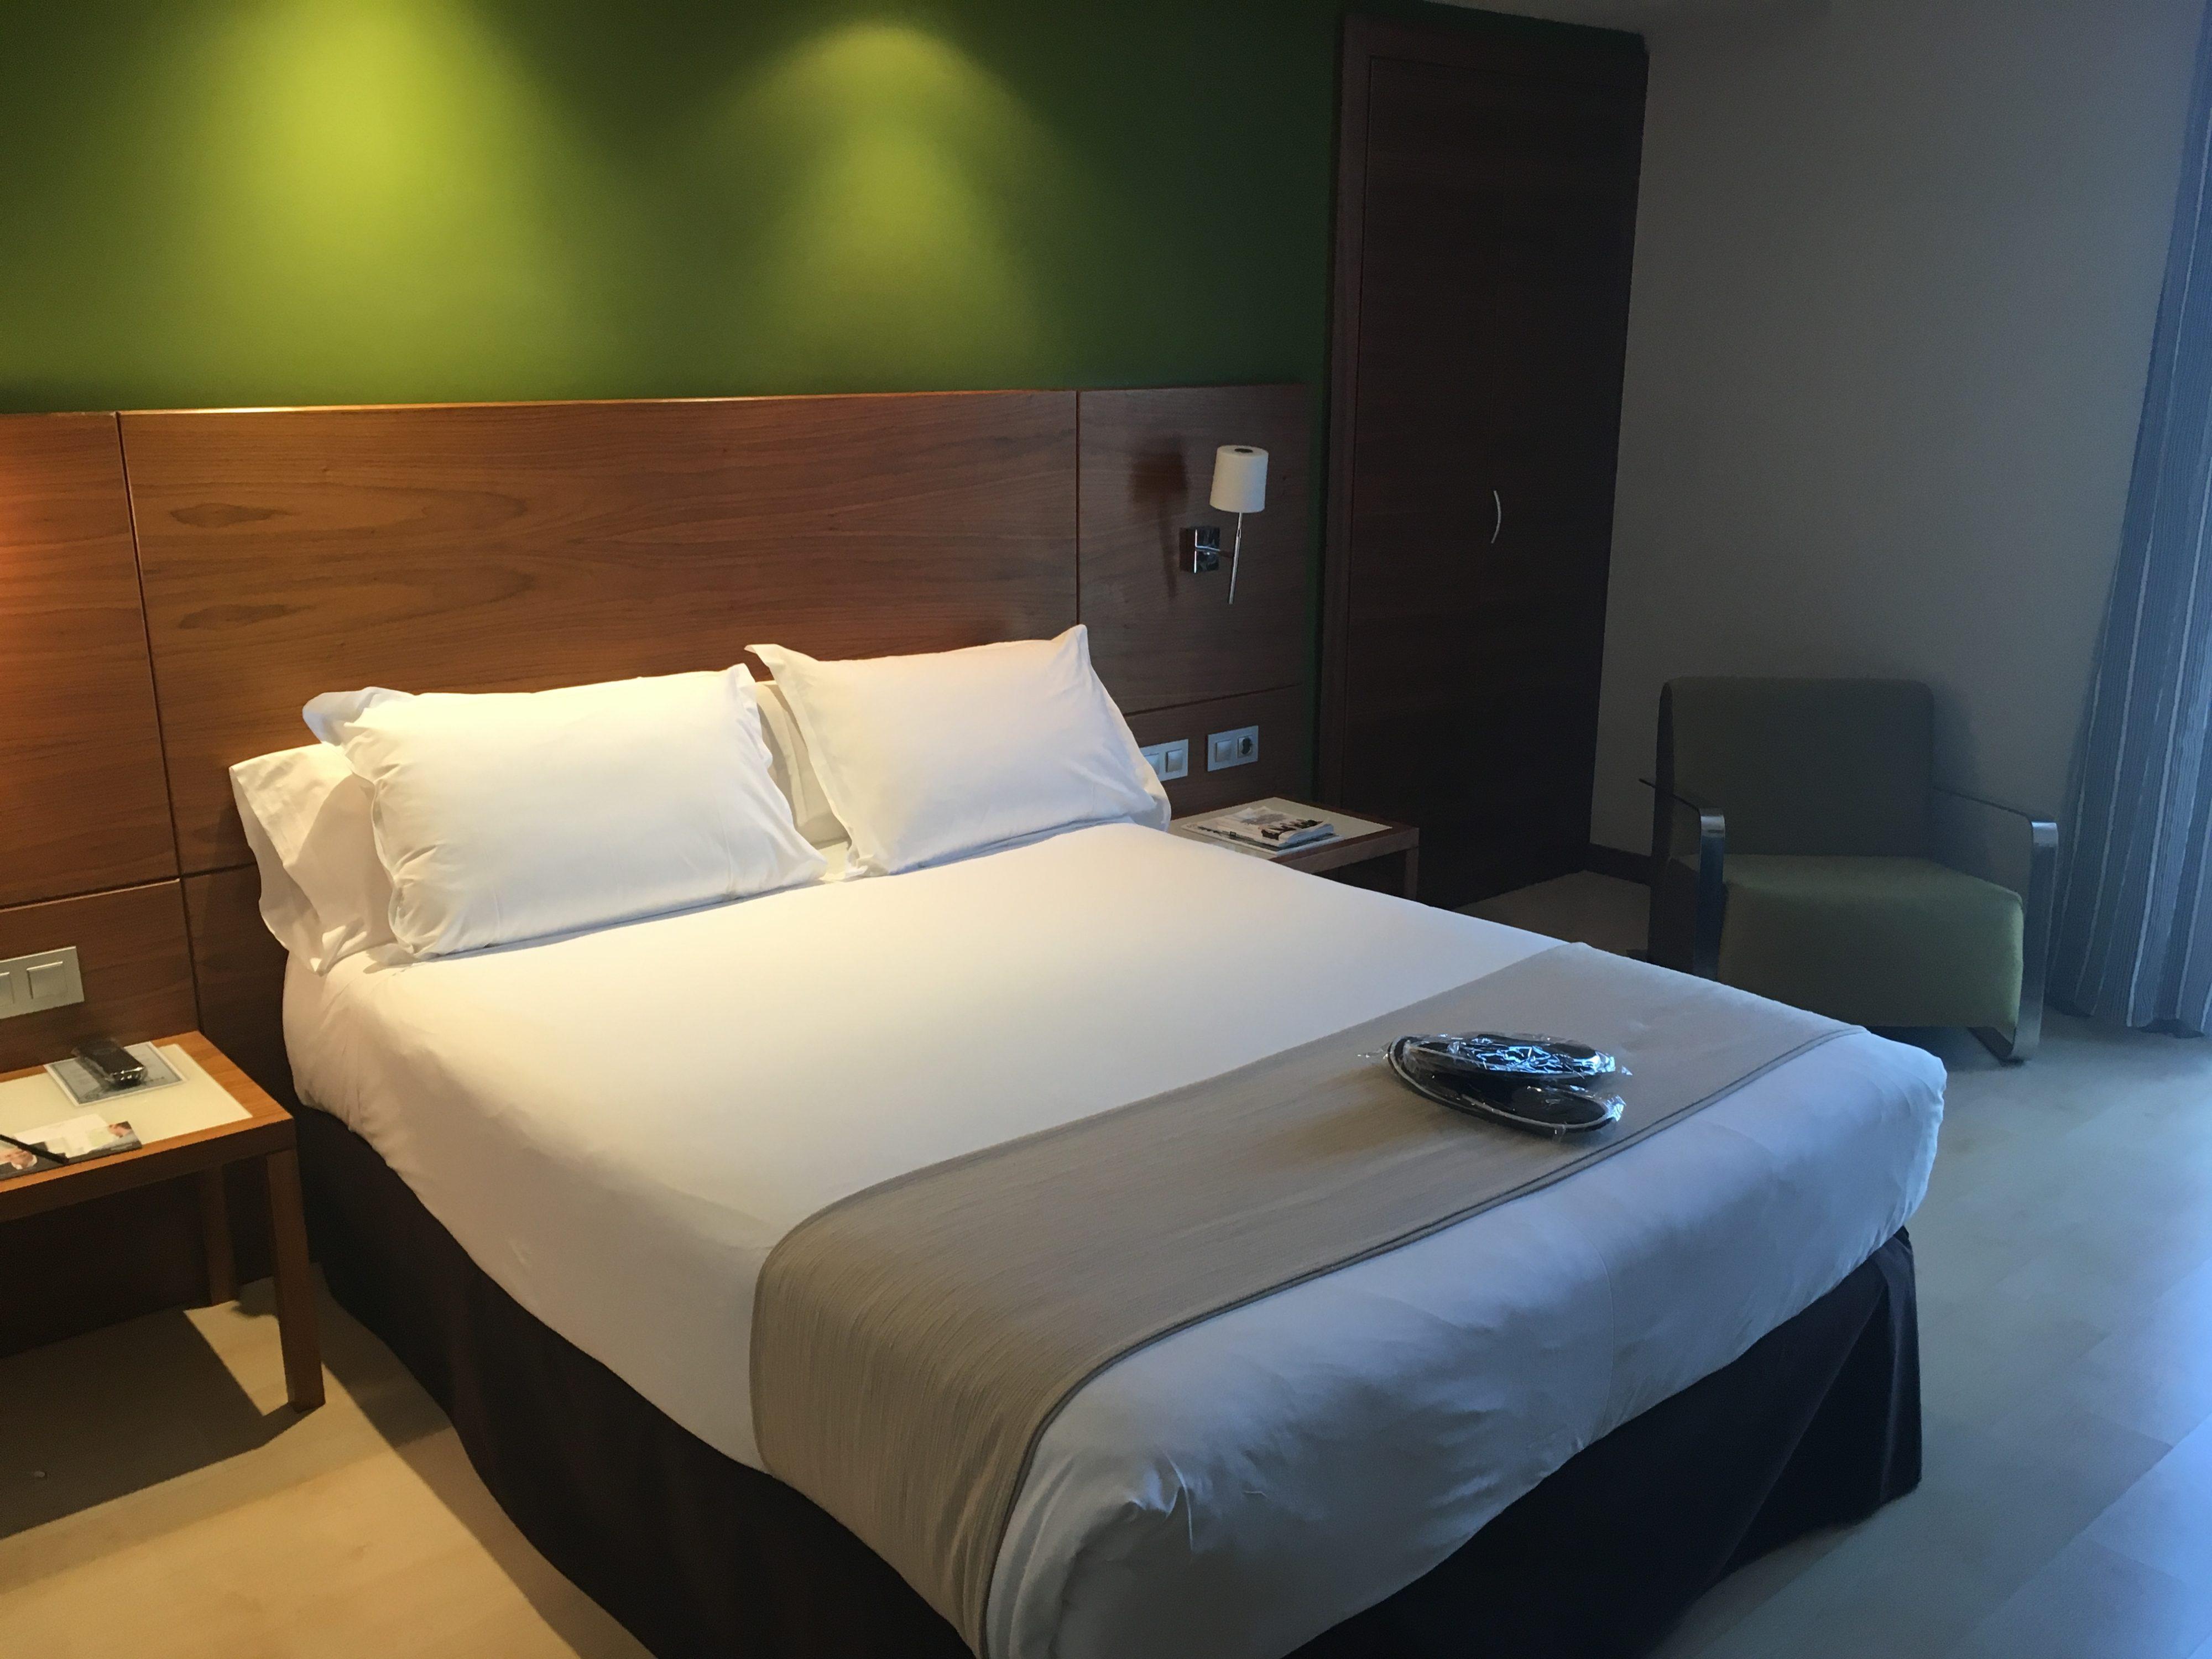 Hôtel Gran Bilbao séjour à Bilbao où dormir où se loger à Bilbao chambre Hotel Gran Bilbao - blog voyage les p'tits touristes (4)